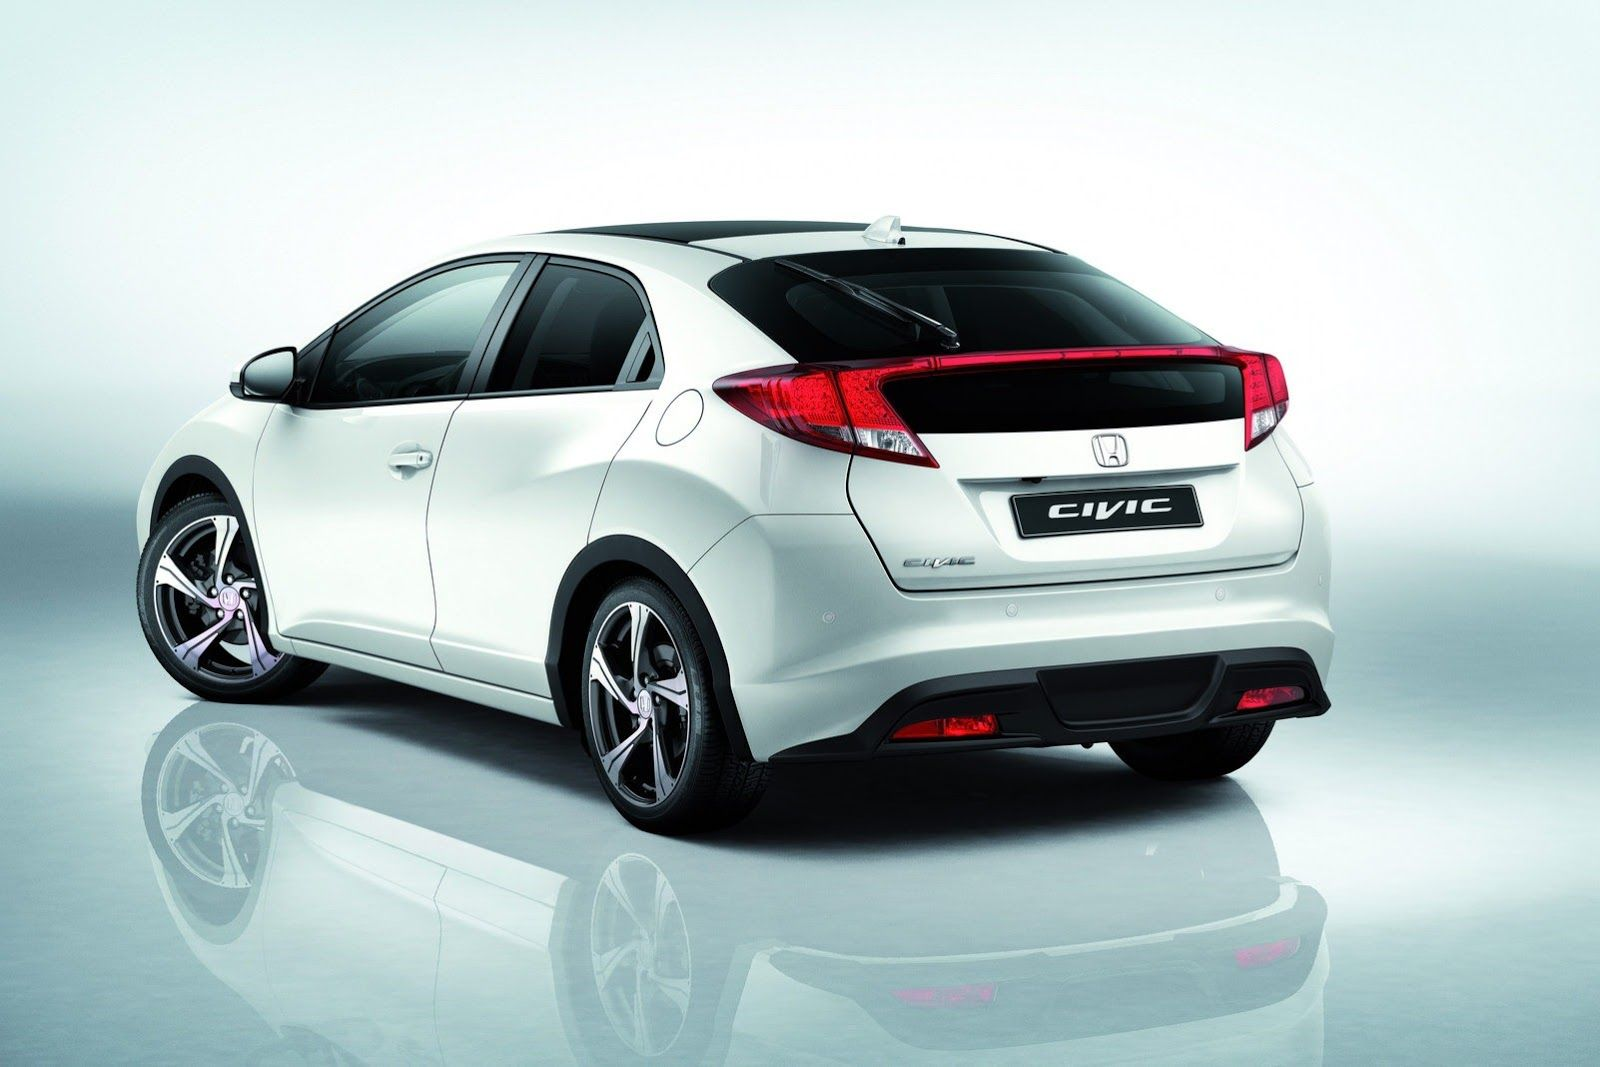 2013 Honda Civic Hatch Aero Pack Style European Version Honda Civic Hatchback Honda Civic Honda